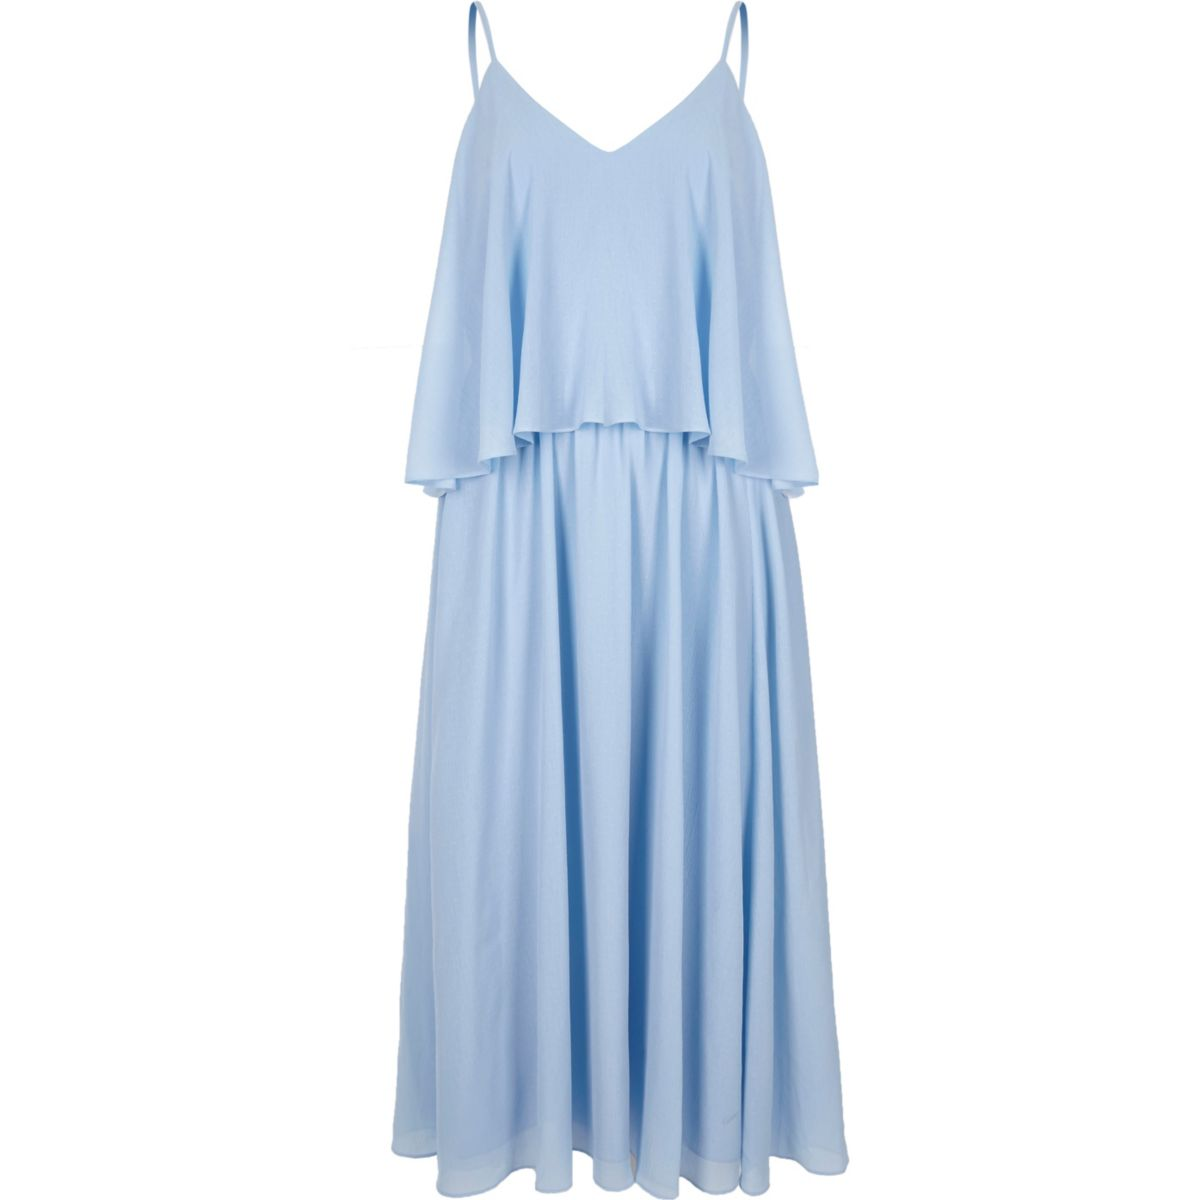 Light blue layer cami midi dress